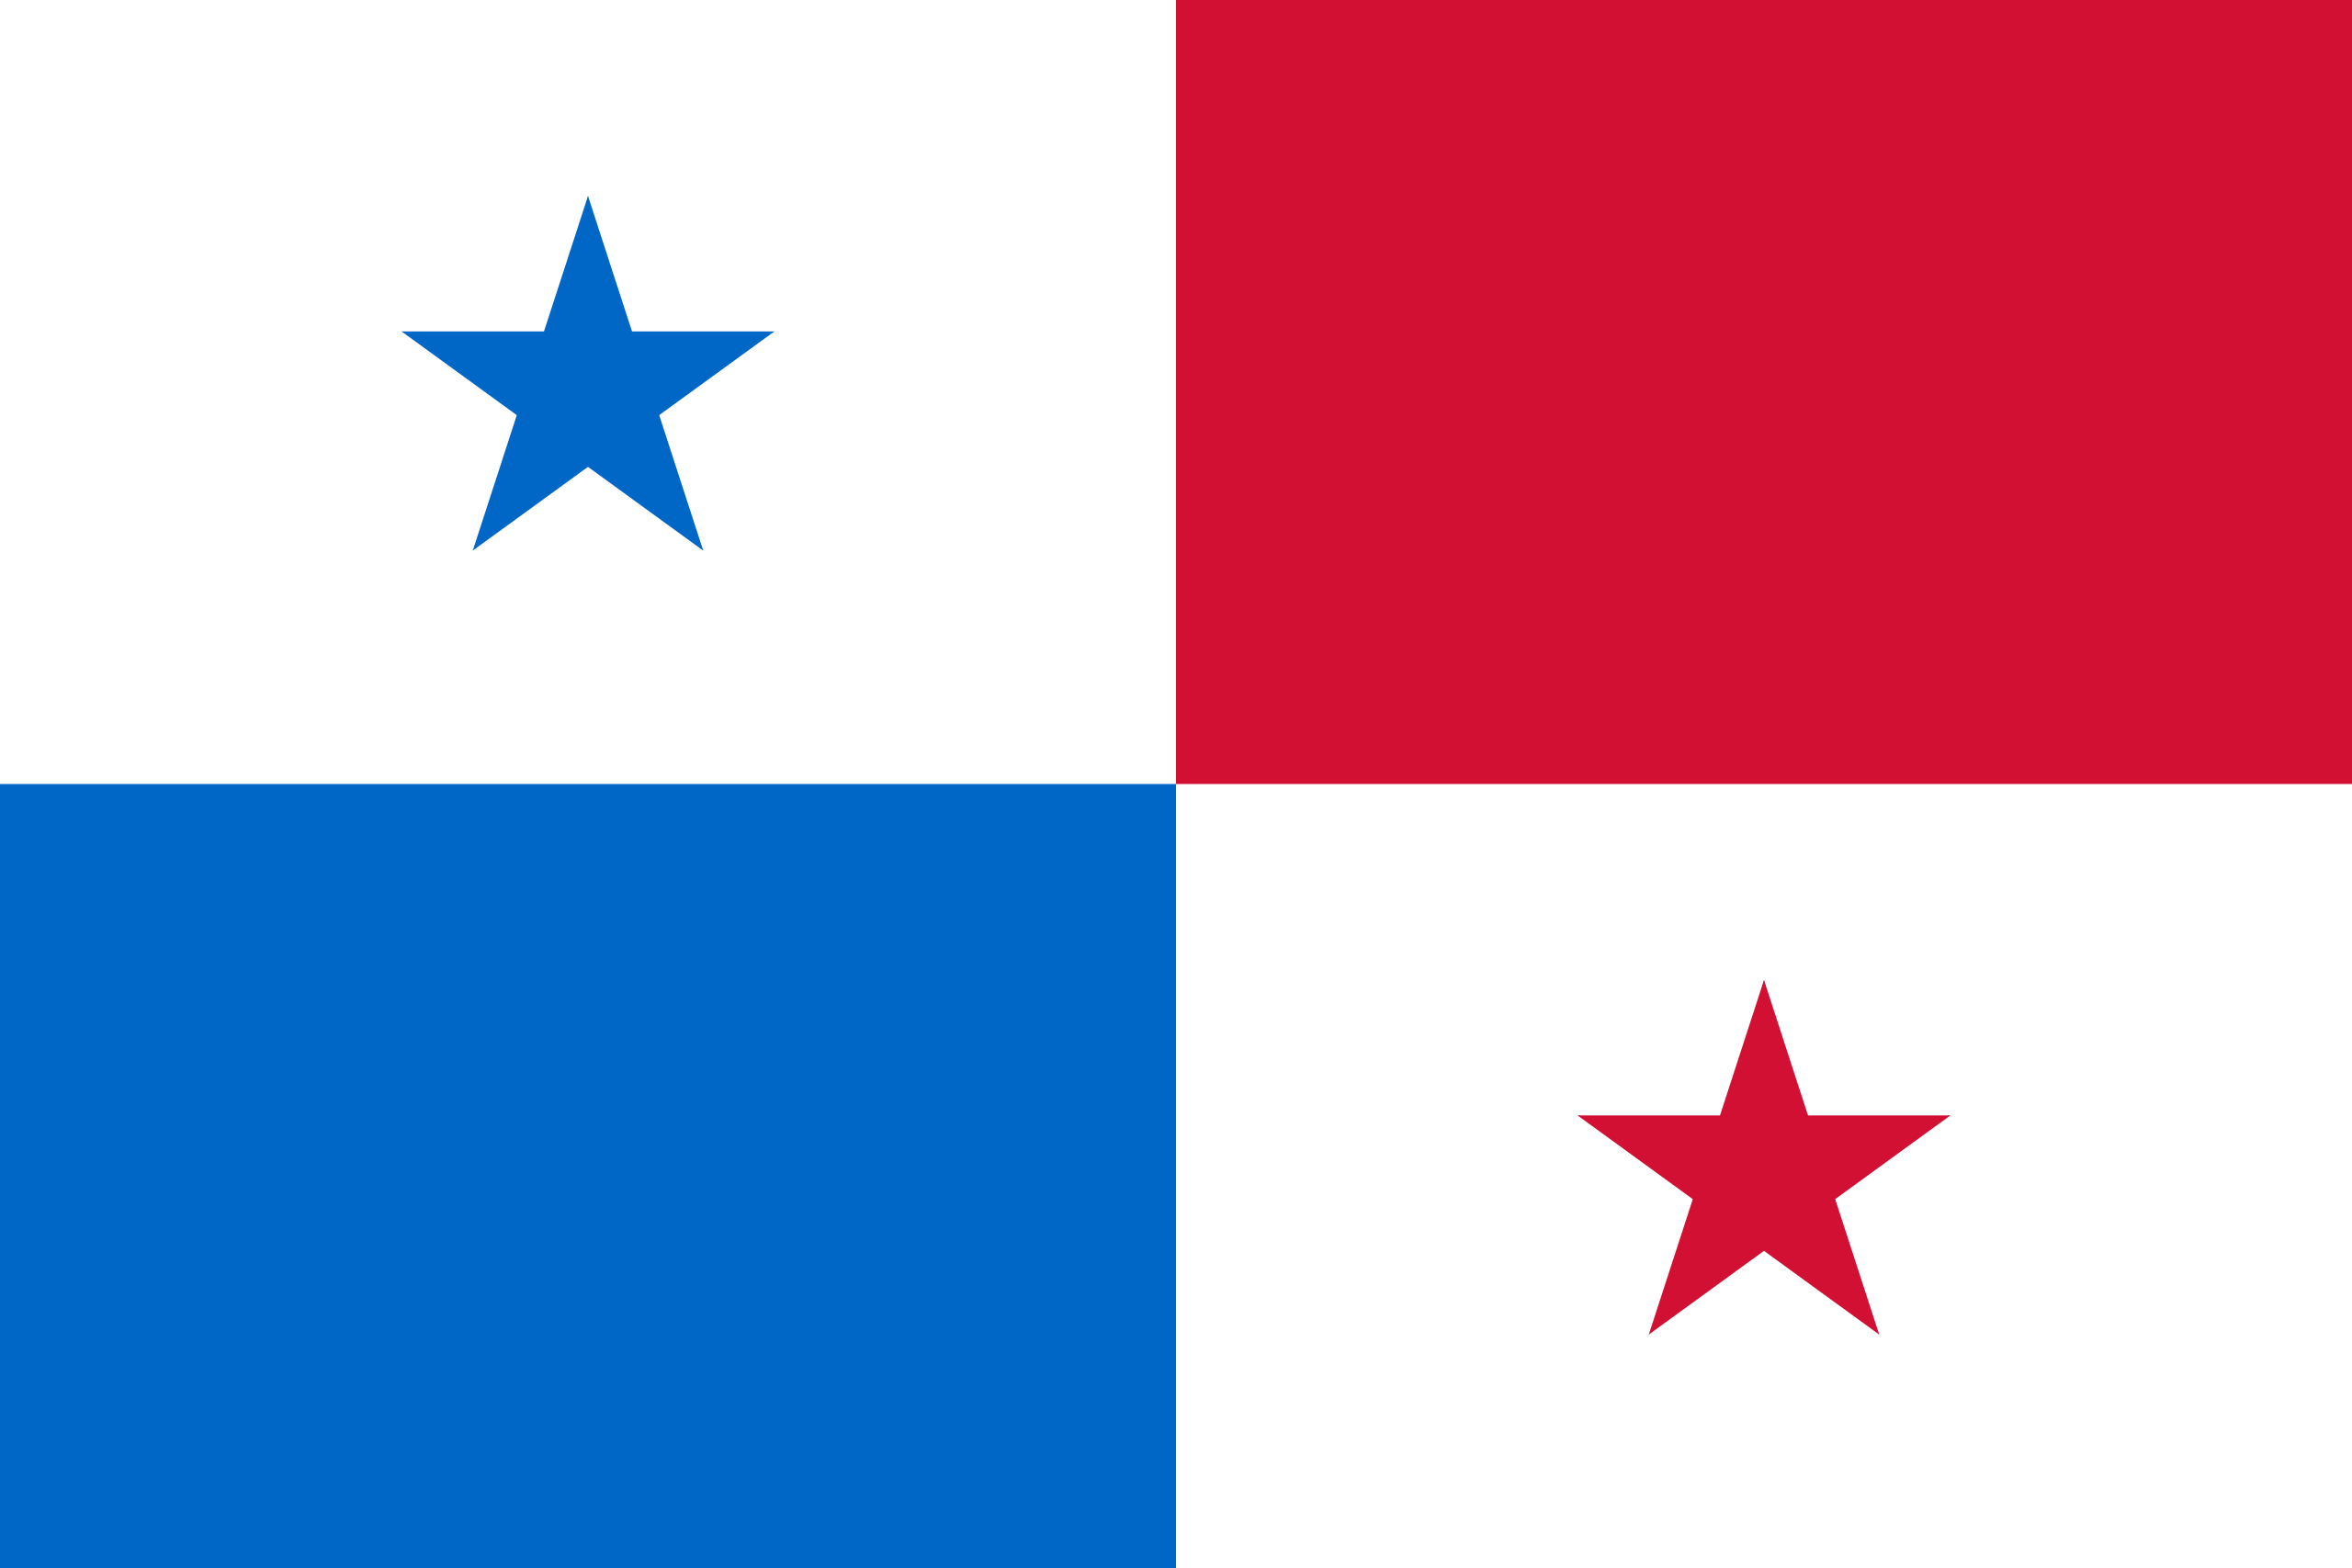 panamá, paese, emblema, logo, simbolo - Sfondi HD - Professor-falken.com